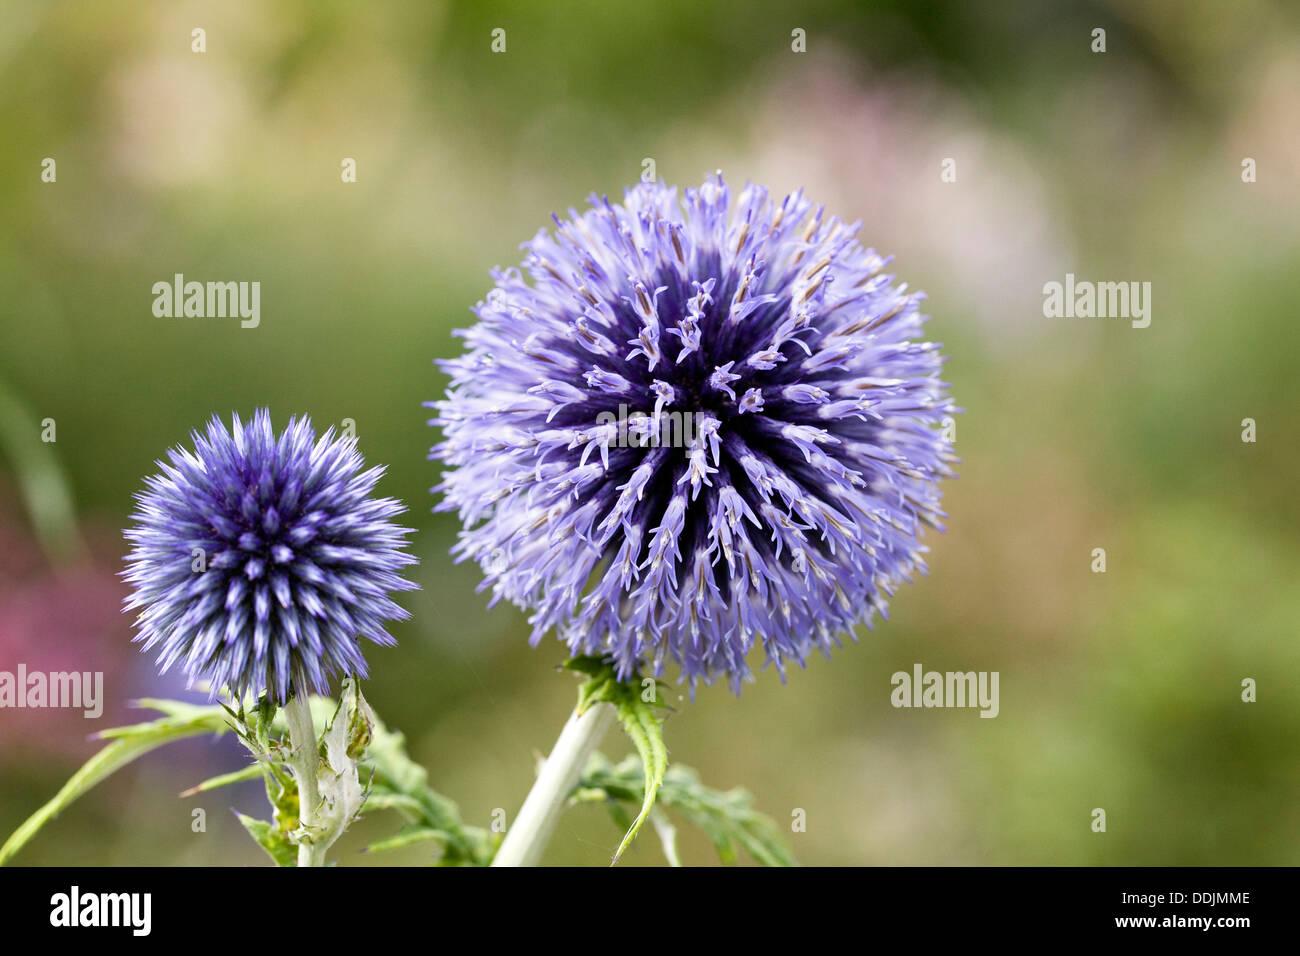 Echinops bannaticus 'Taplow Blue'. Globe thistle flower. - Stock Image